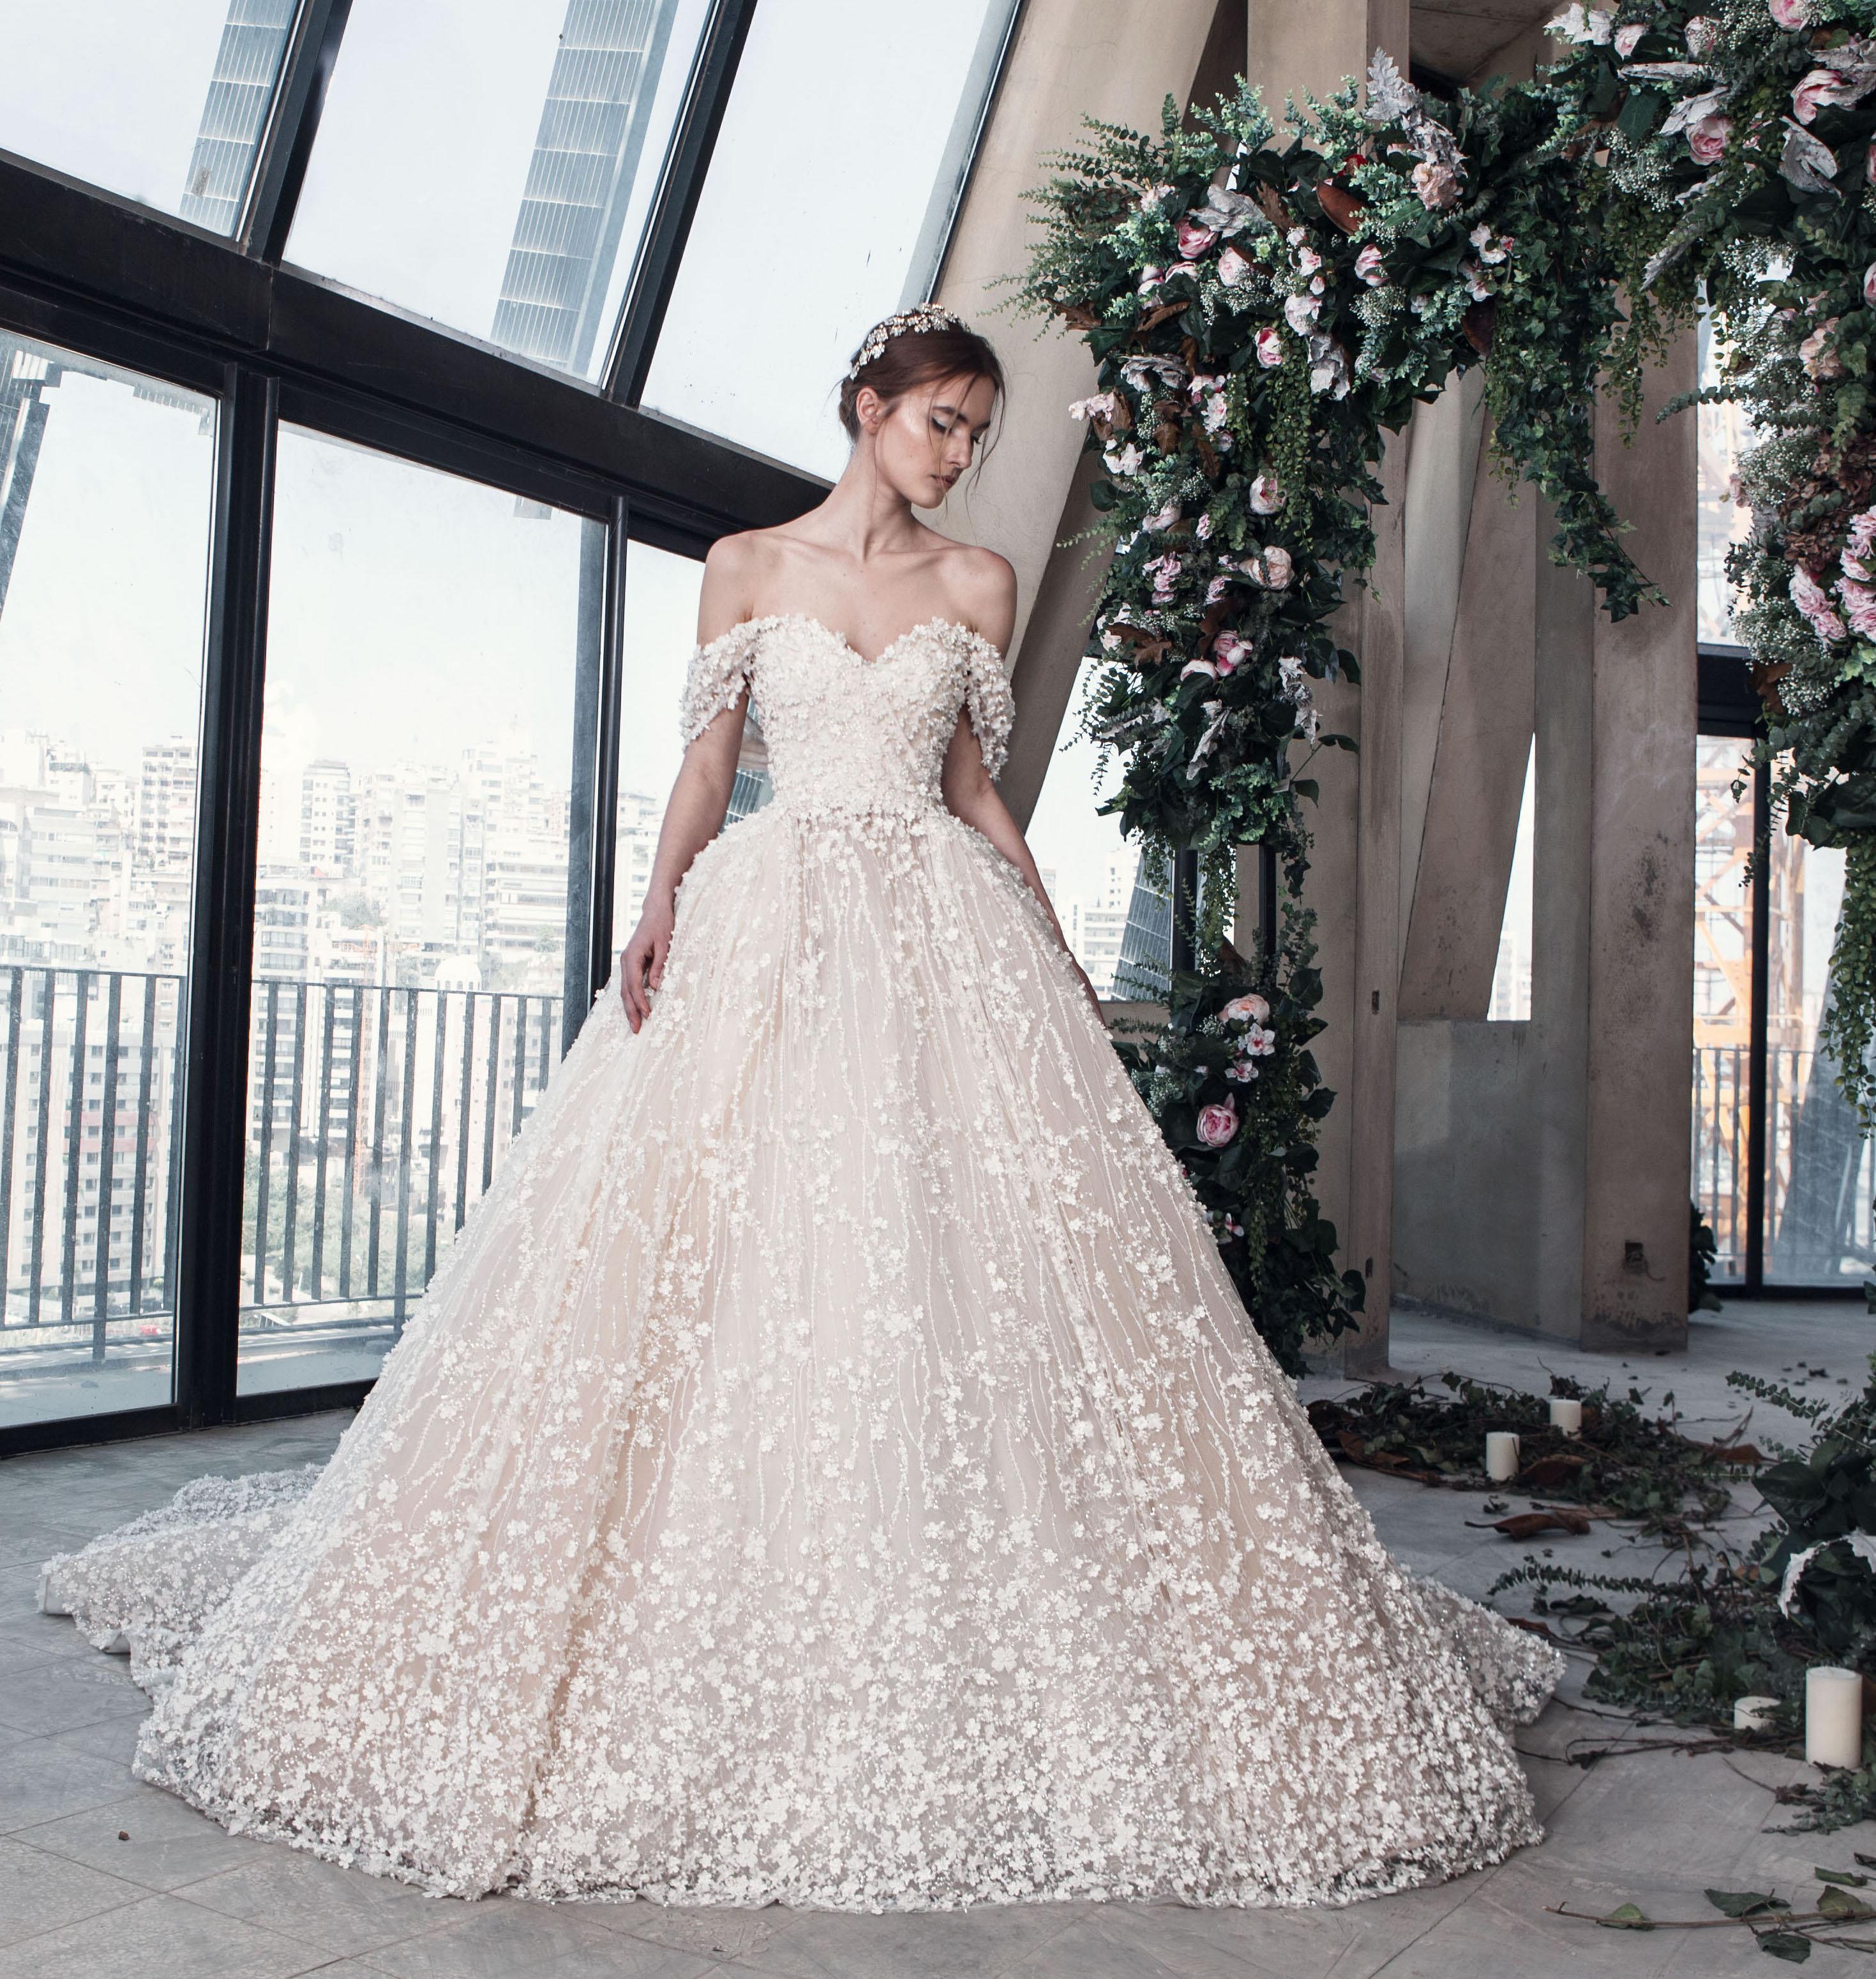 بالصور احدث فساتين الزفاف , موديلات فساتين زفاف جديده لعام 2019 3724 5